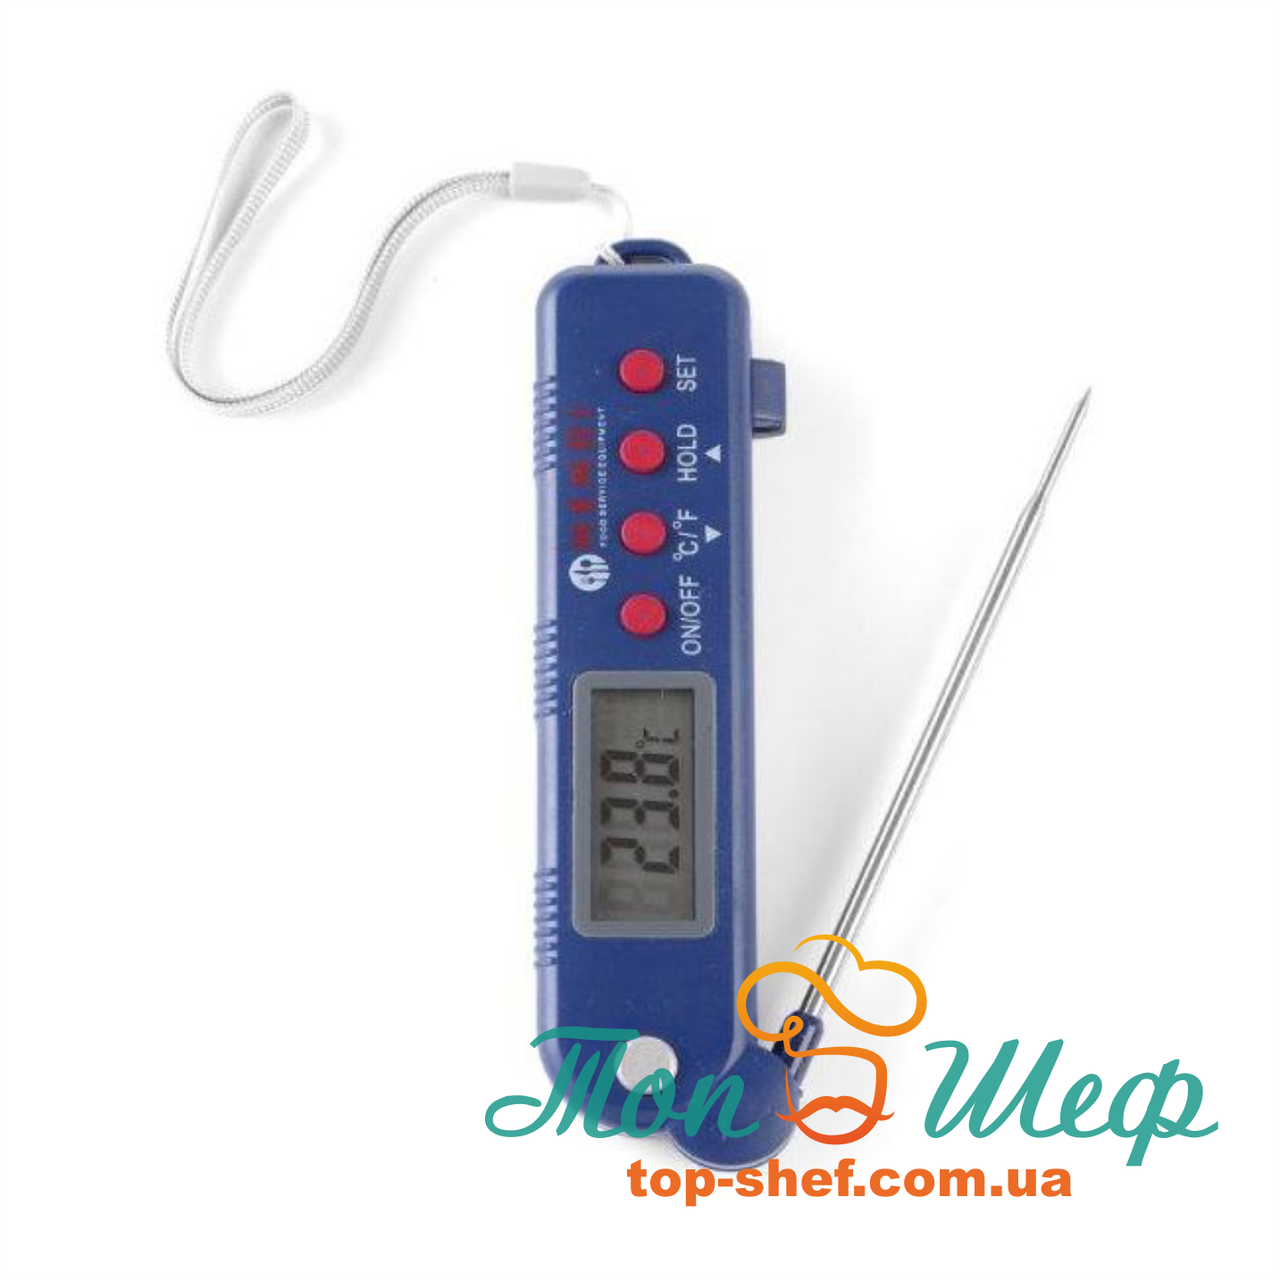 Термометр цифровой со складным зондом Hendi 271308